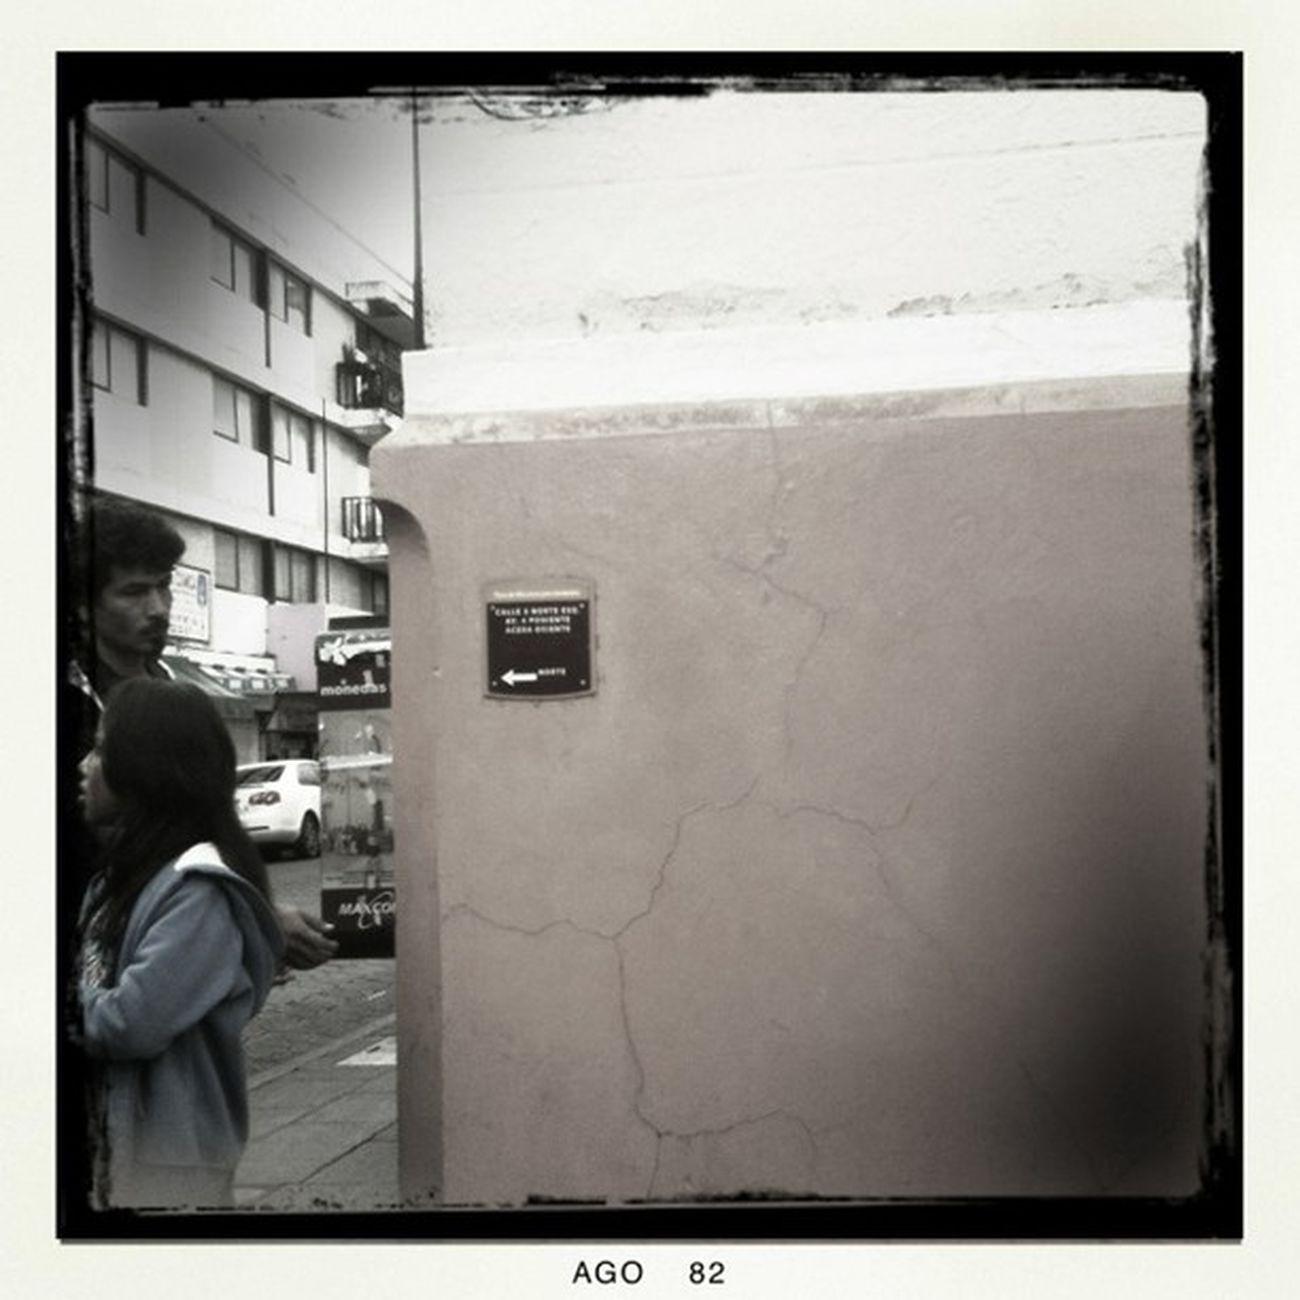 Raro intermedio. #Hipstamatic #BuckhorstH1 #BlacKeysBW #PopRox Street Hipstamatic Corner Bw Calle Blancoynegro Mextagram Bn Esquina Poprox Blackeysbw Buckhorsth1 Igersmexico